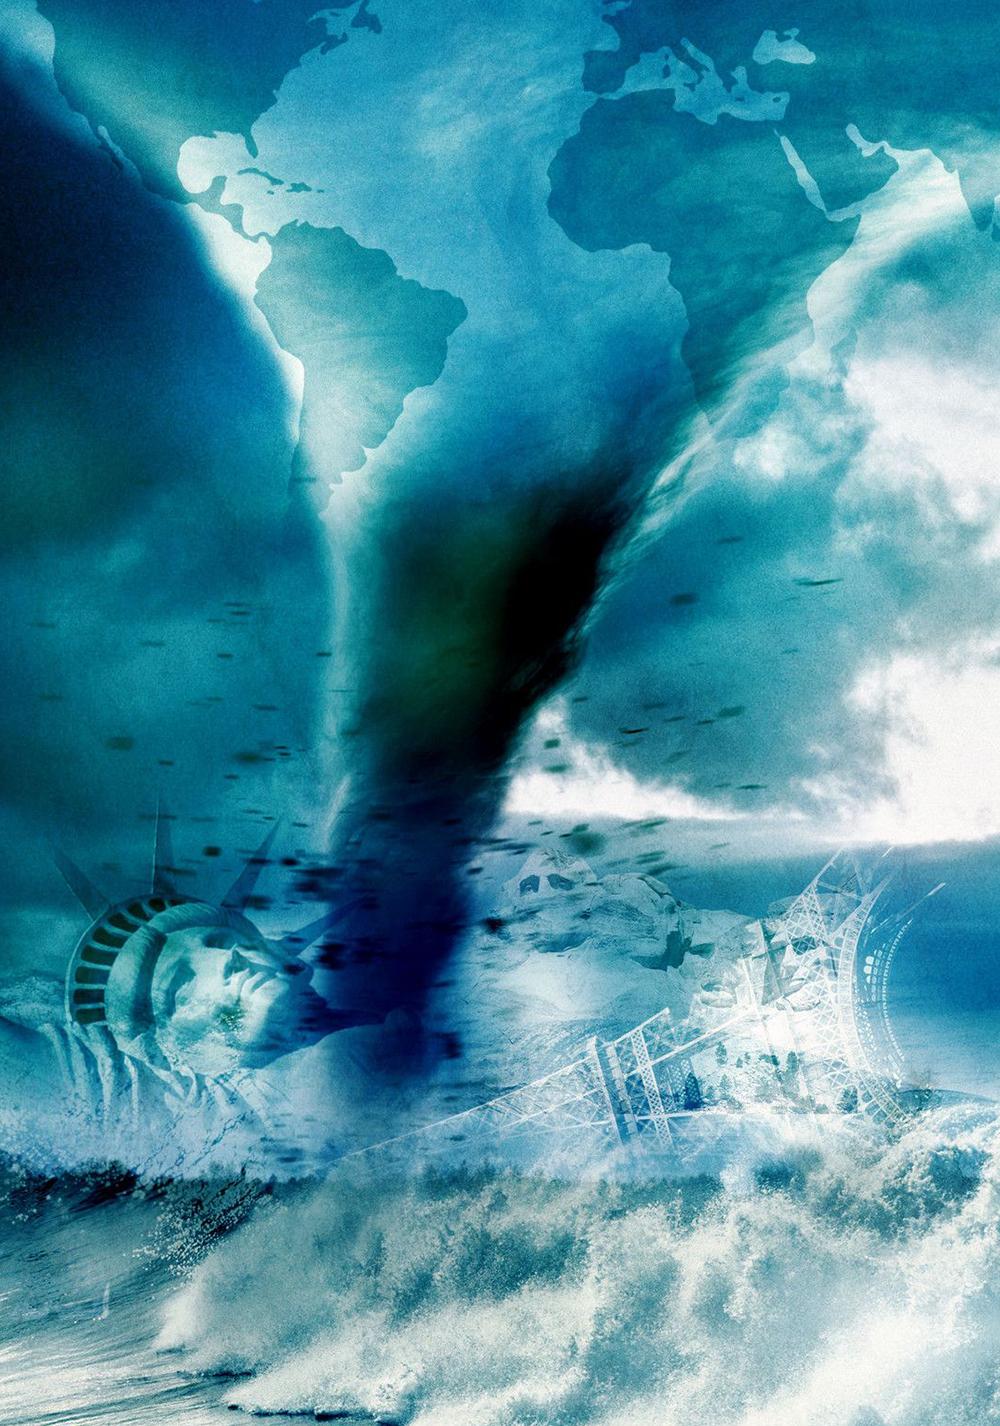 Category 7: The End of the World | Movie fanart | fanart.tv